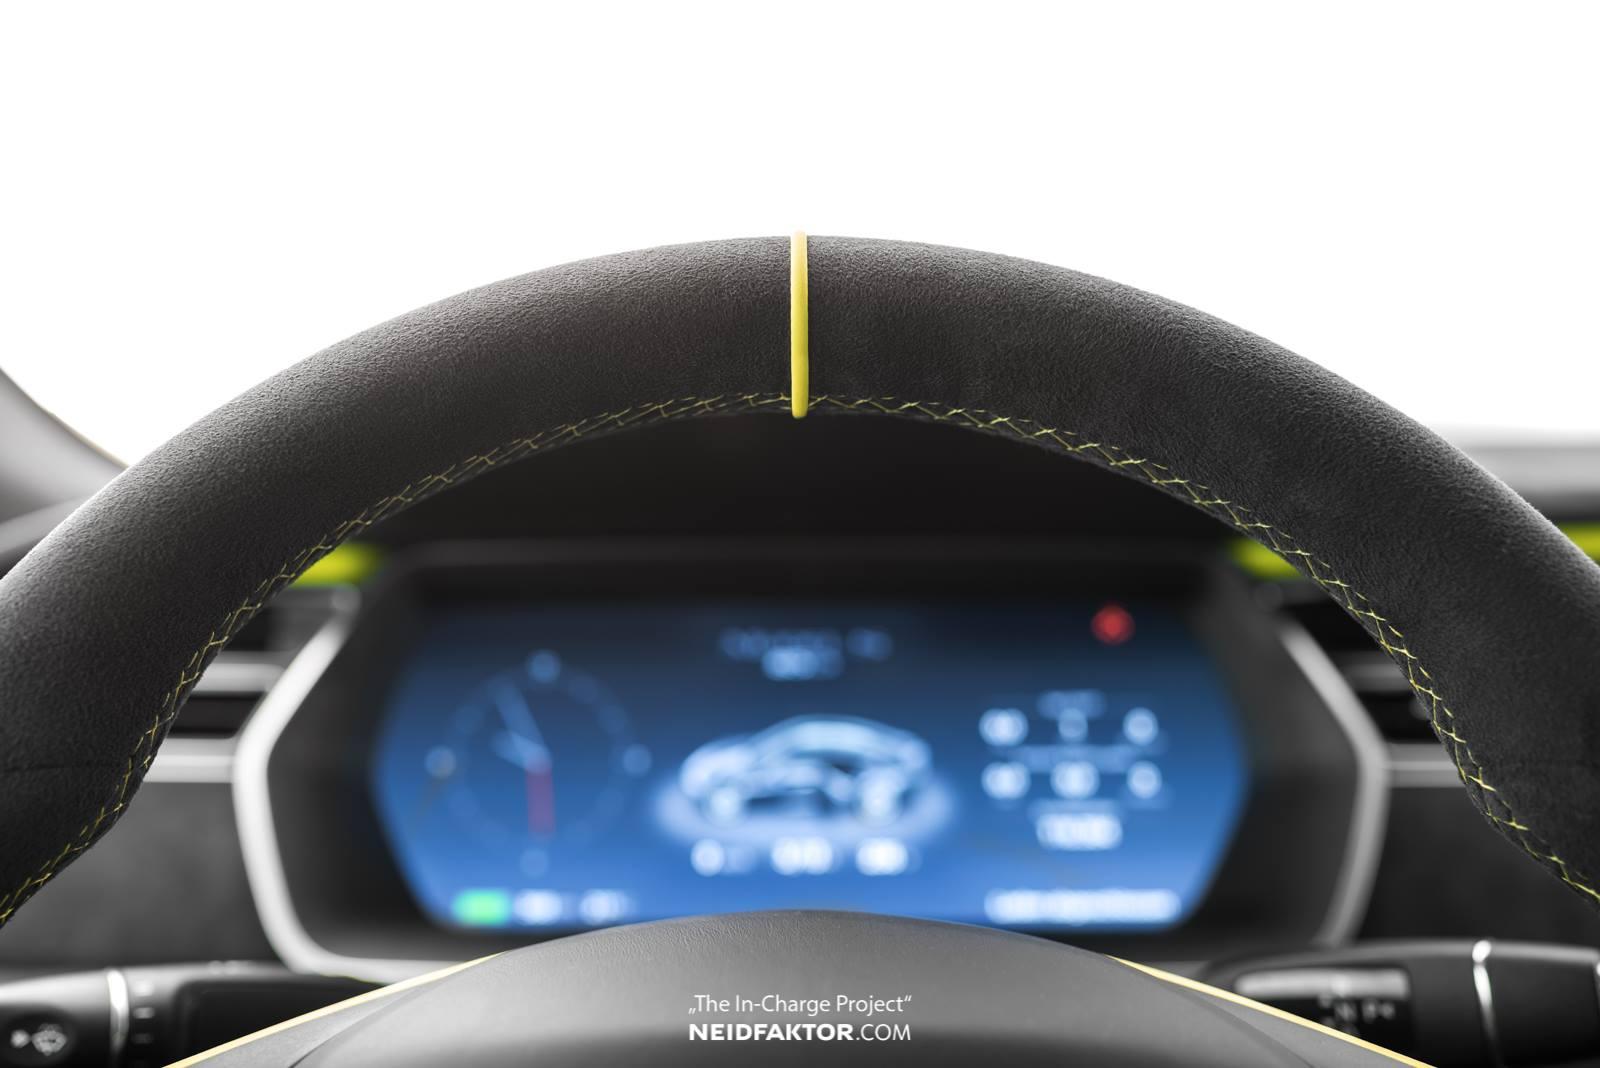 Tesla_Model_S_Neidfaktor_0000